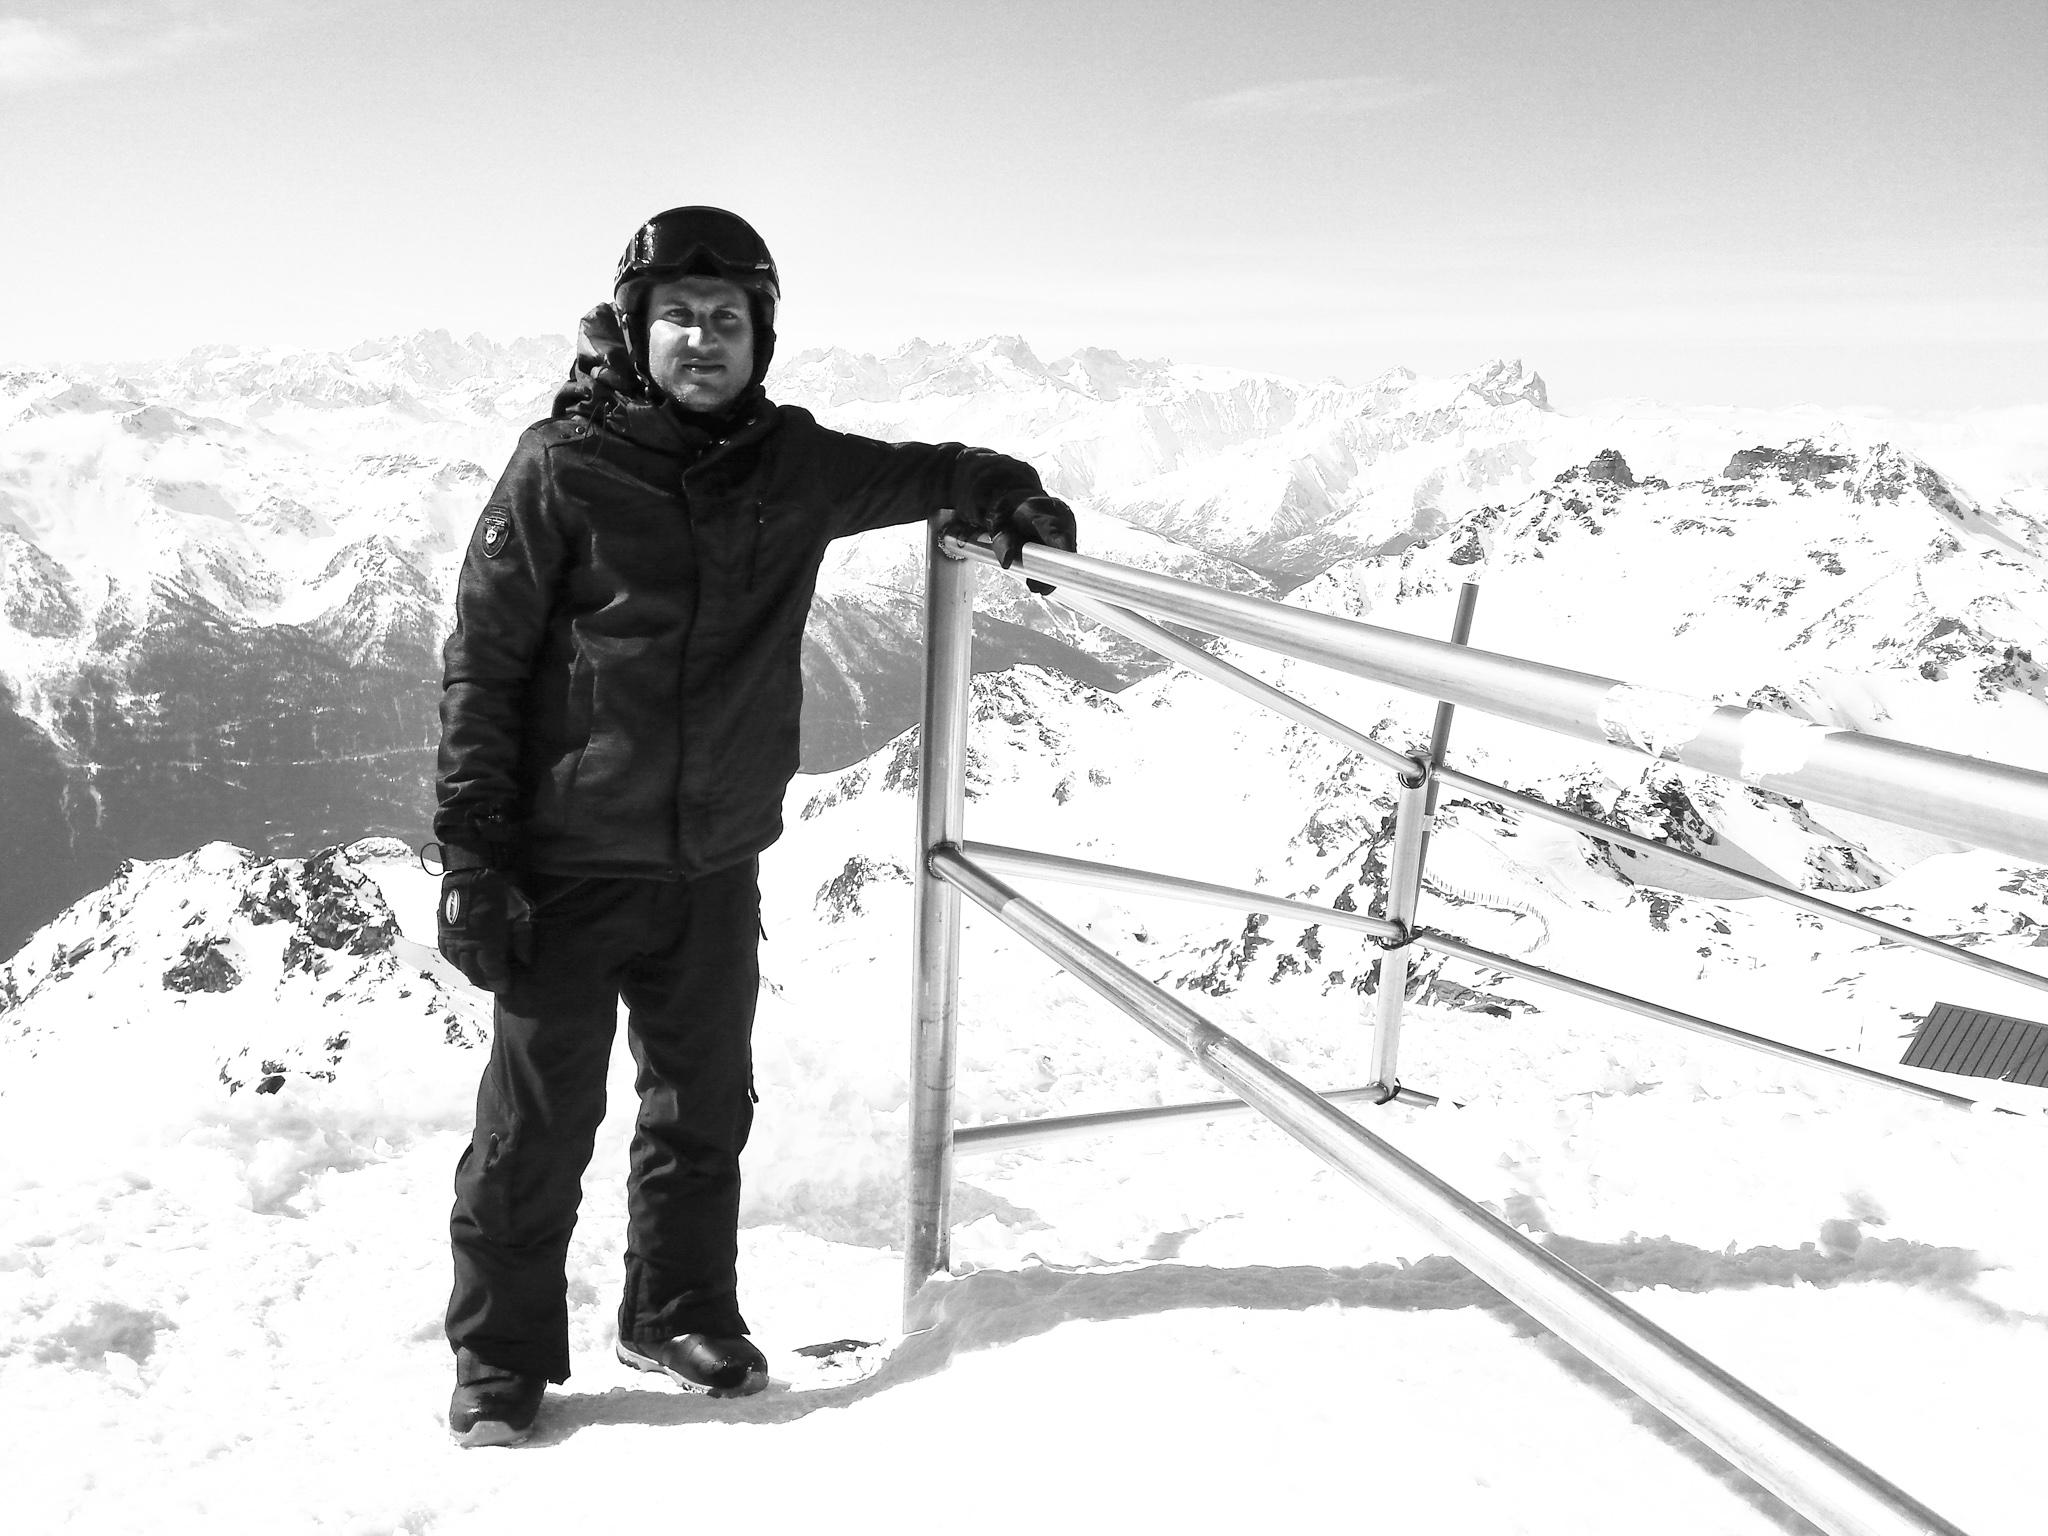 111335-val-thorens-snowboarder-portrait.jpg